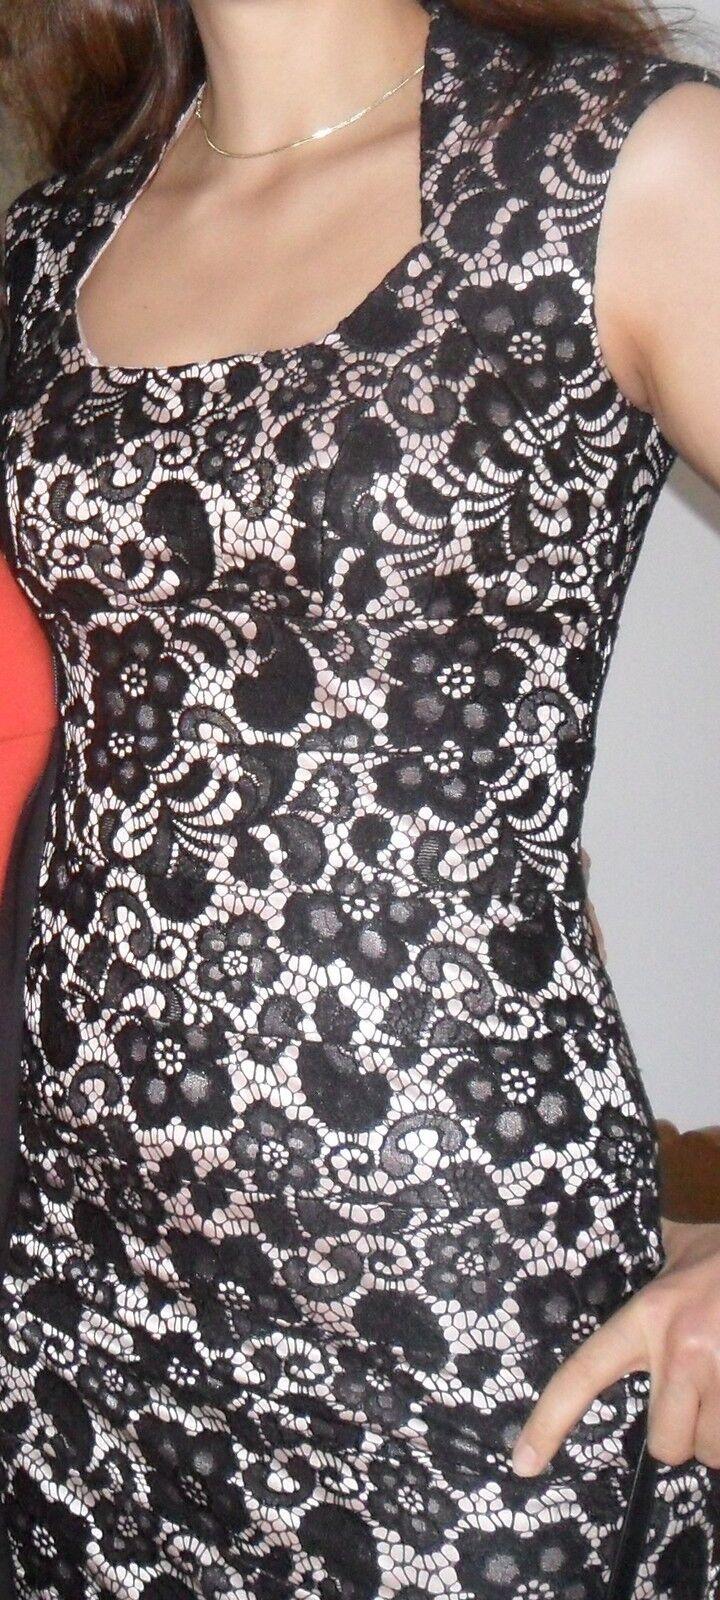 Jax Kleid Damenkleid 40 42  Dress US Größe 10